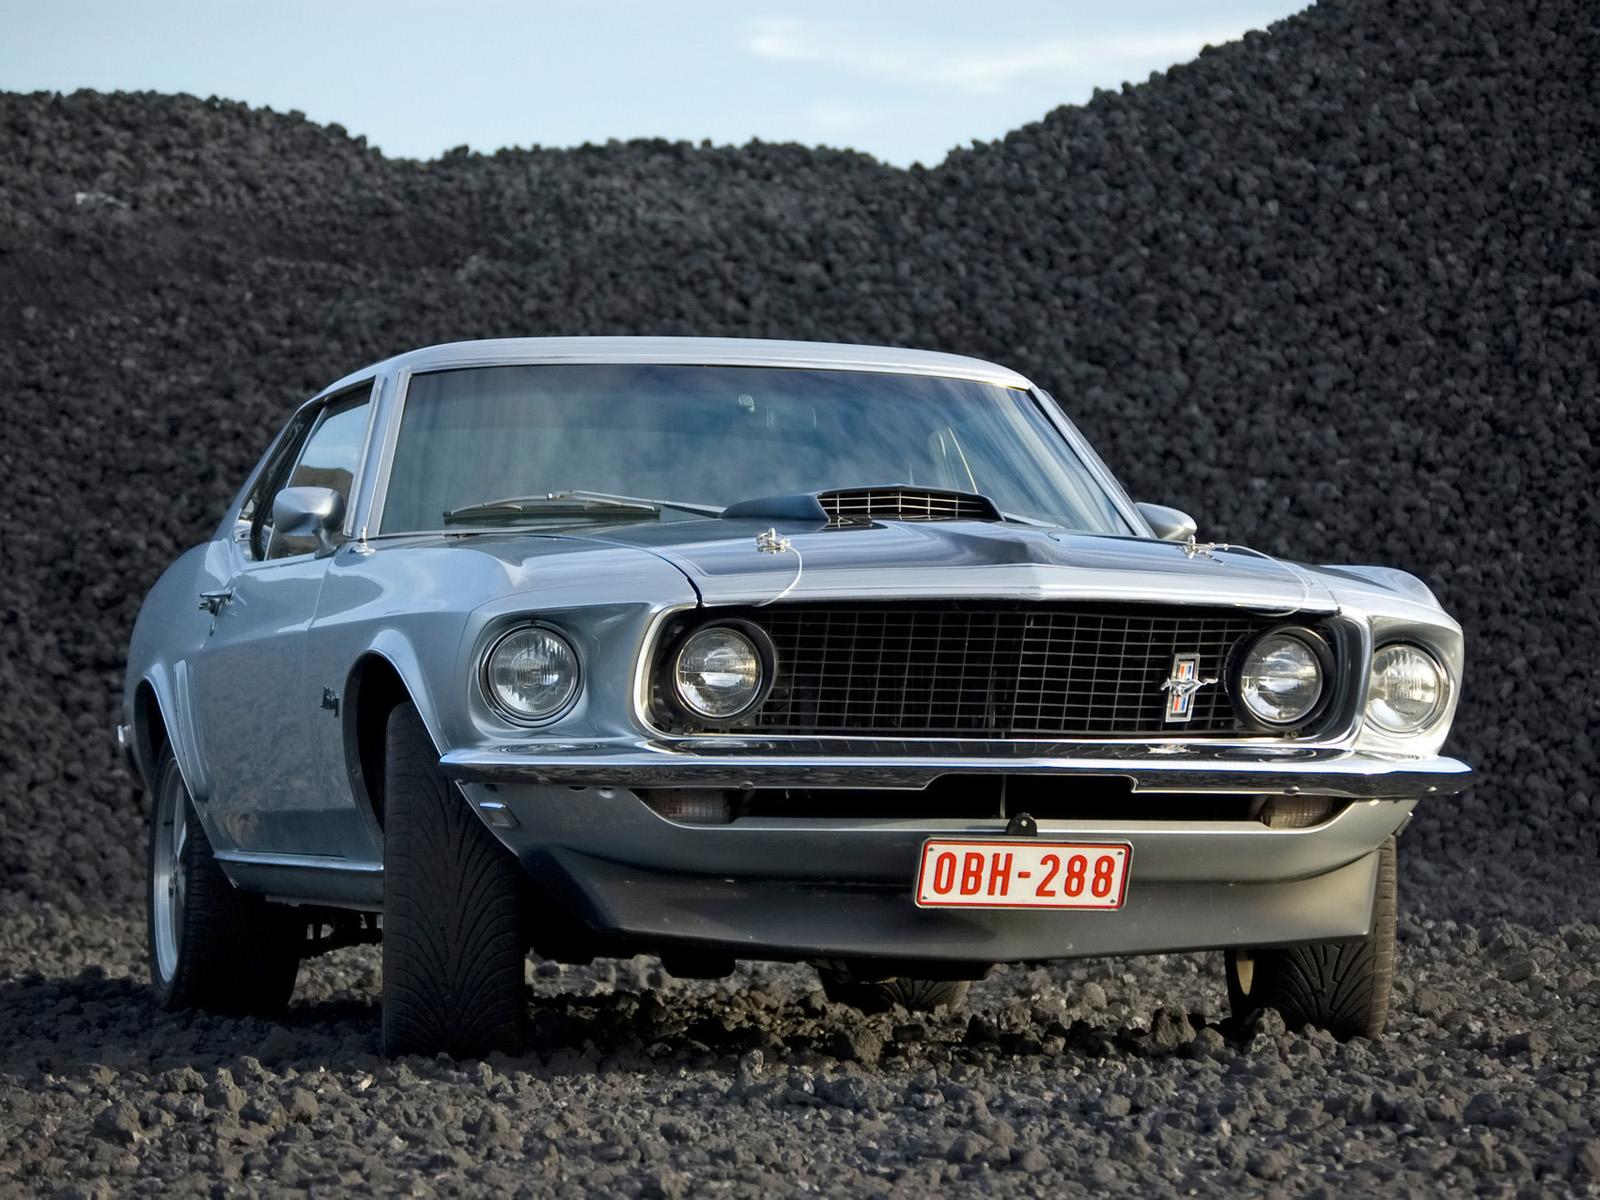 1969 ford mustang hardtop gravel front angle 1600x1200 jpg